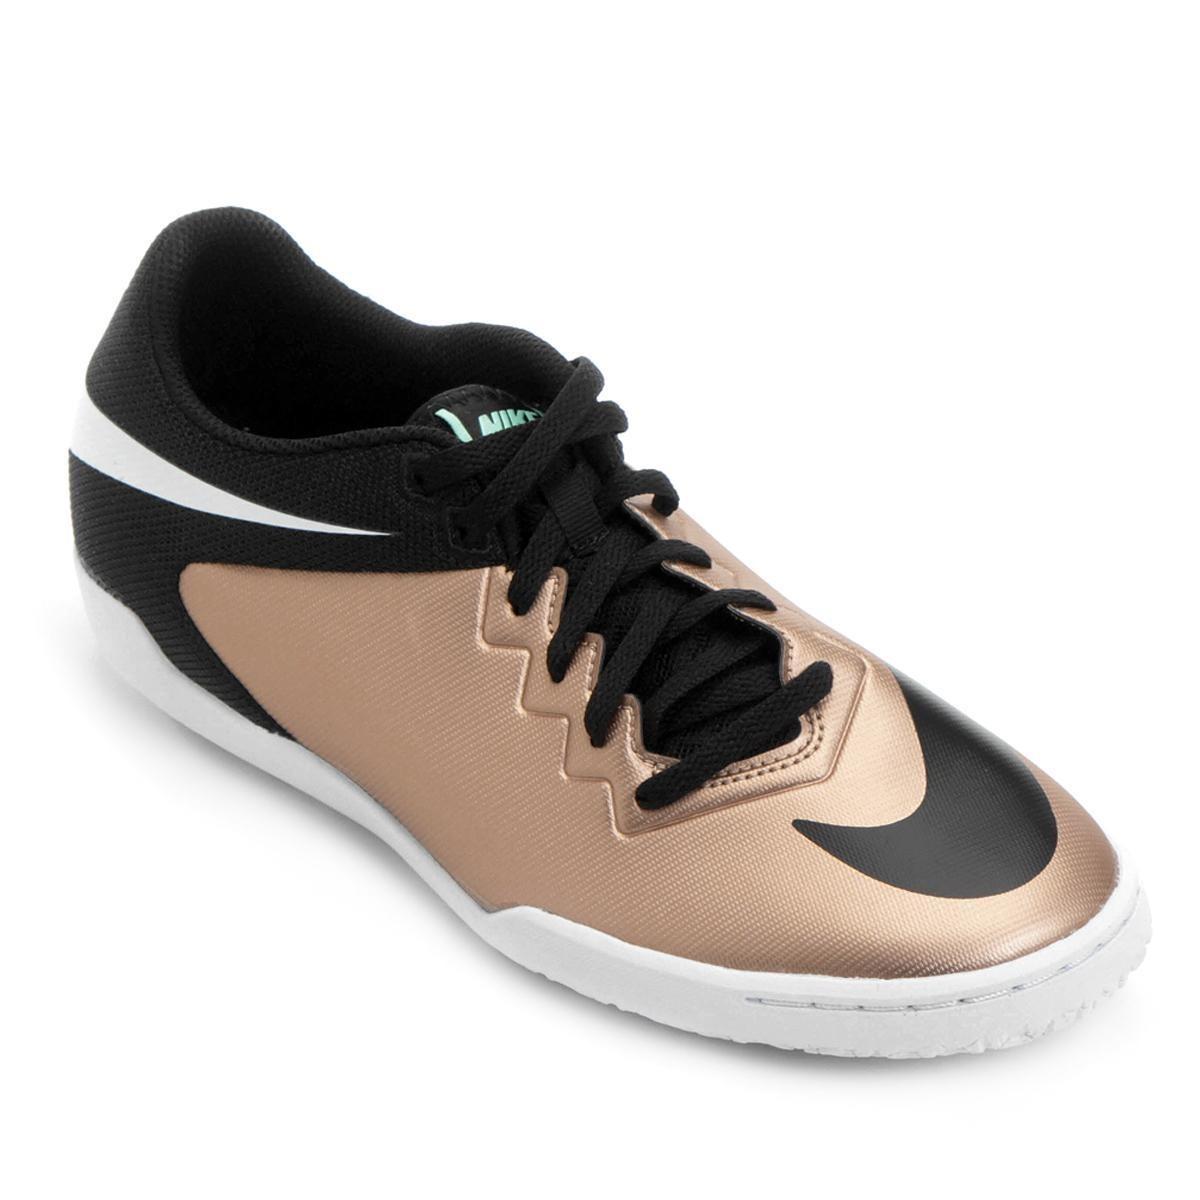 6d8217f991 Chuteira Futsal Nike Hypervenomx Pro Ic - 109737